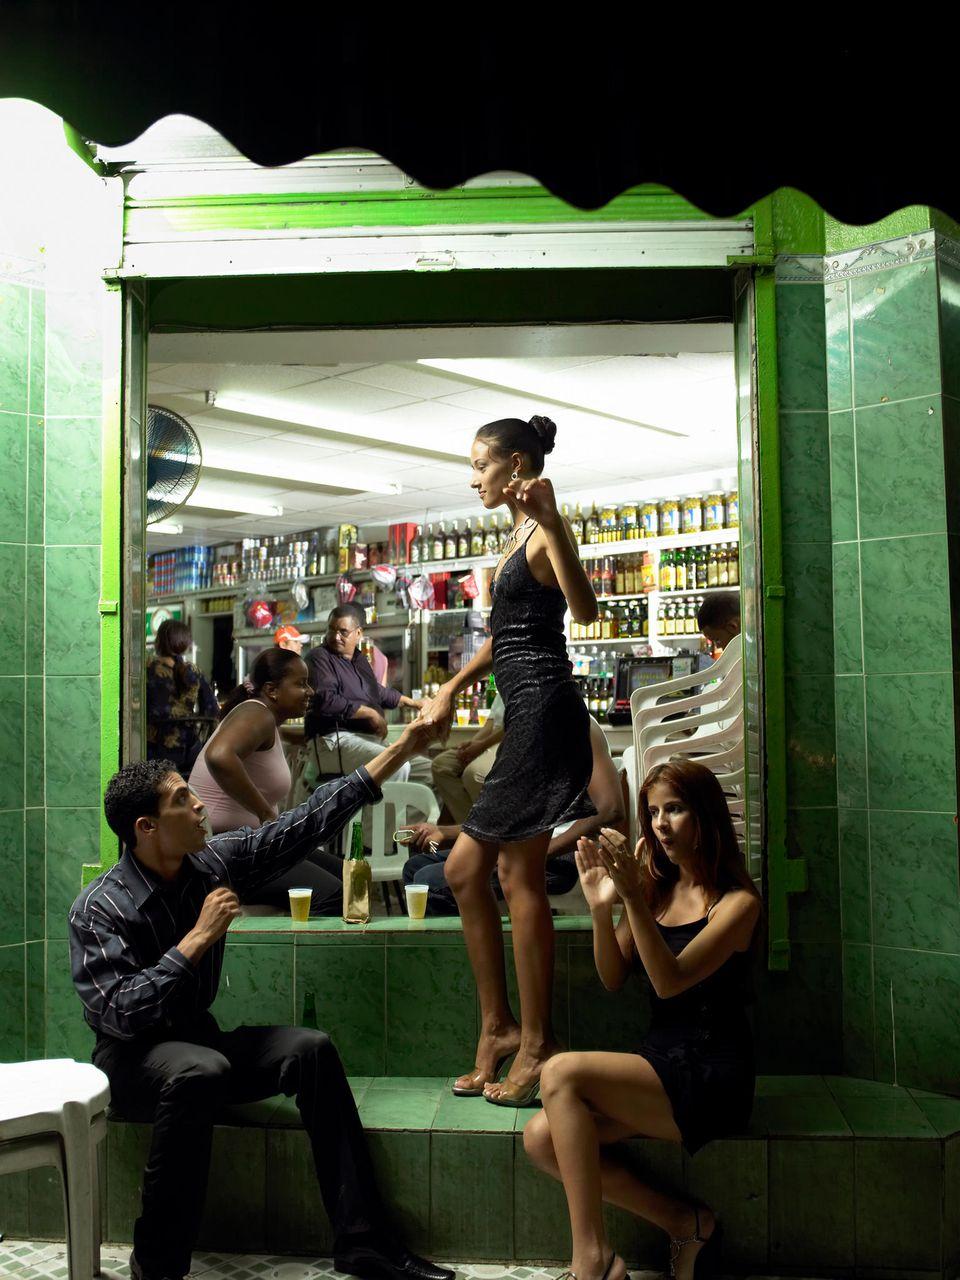 Dominikanische Republik: Party